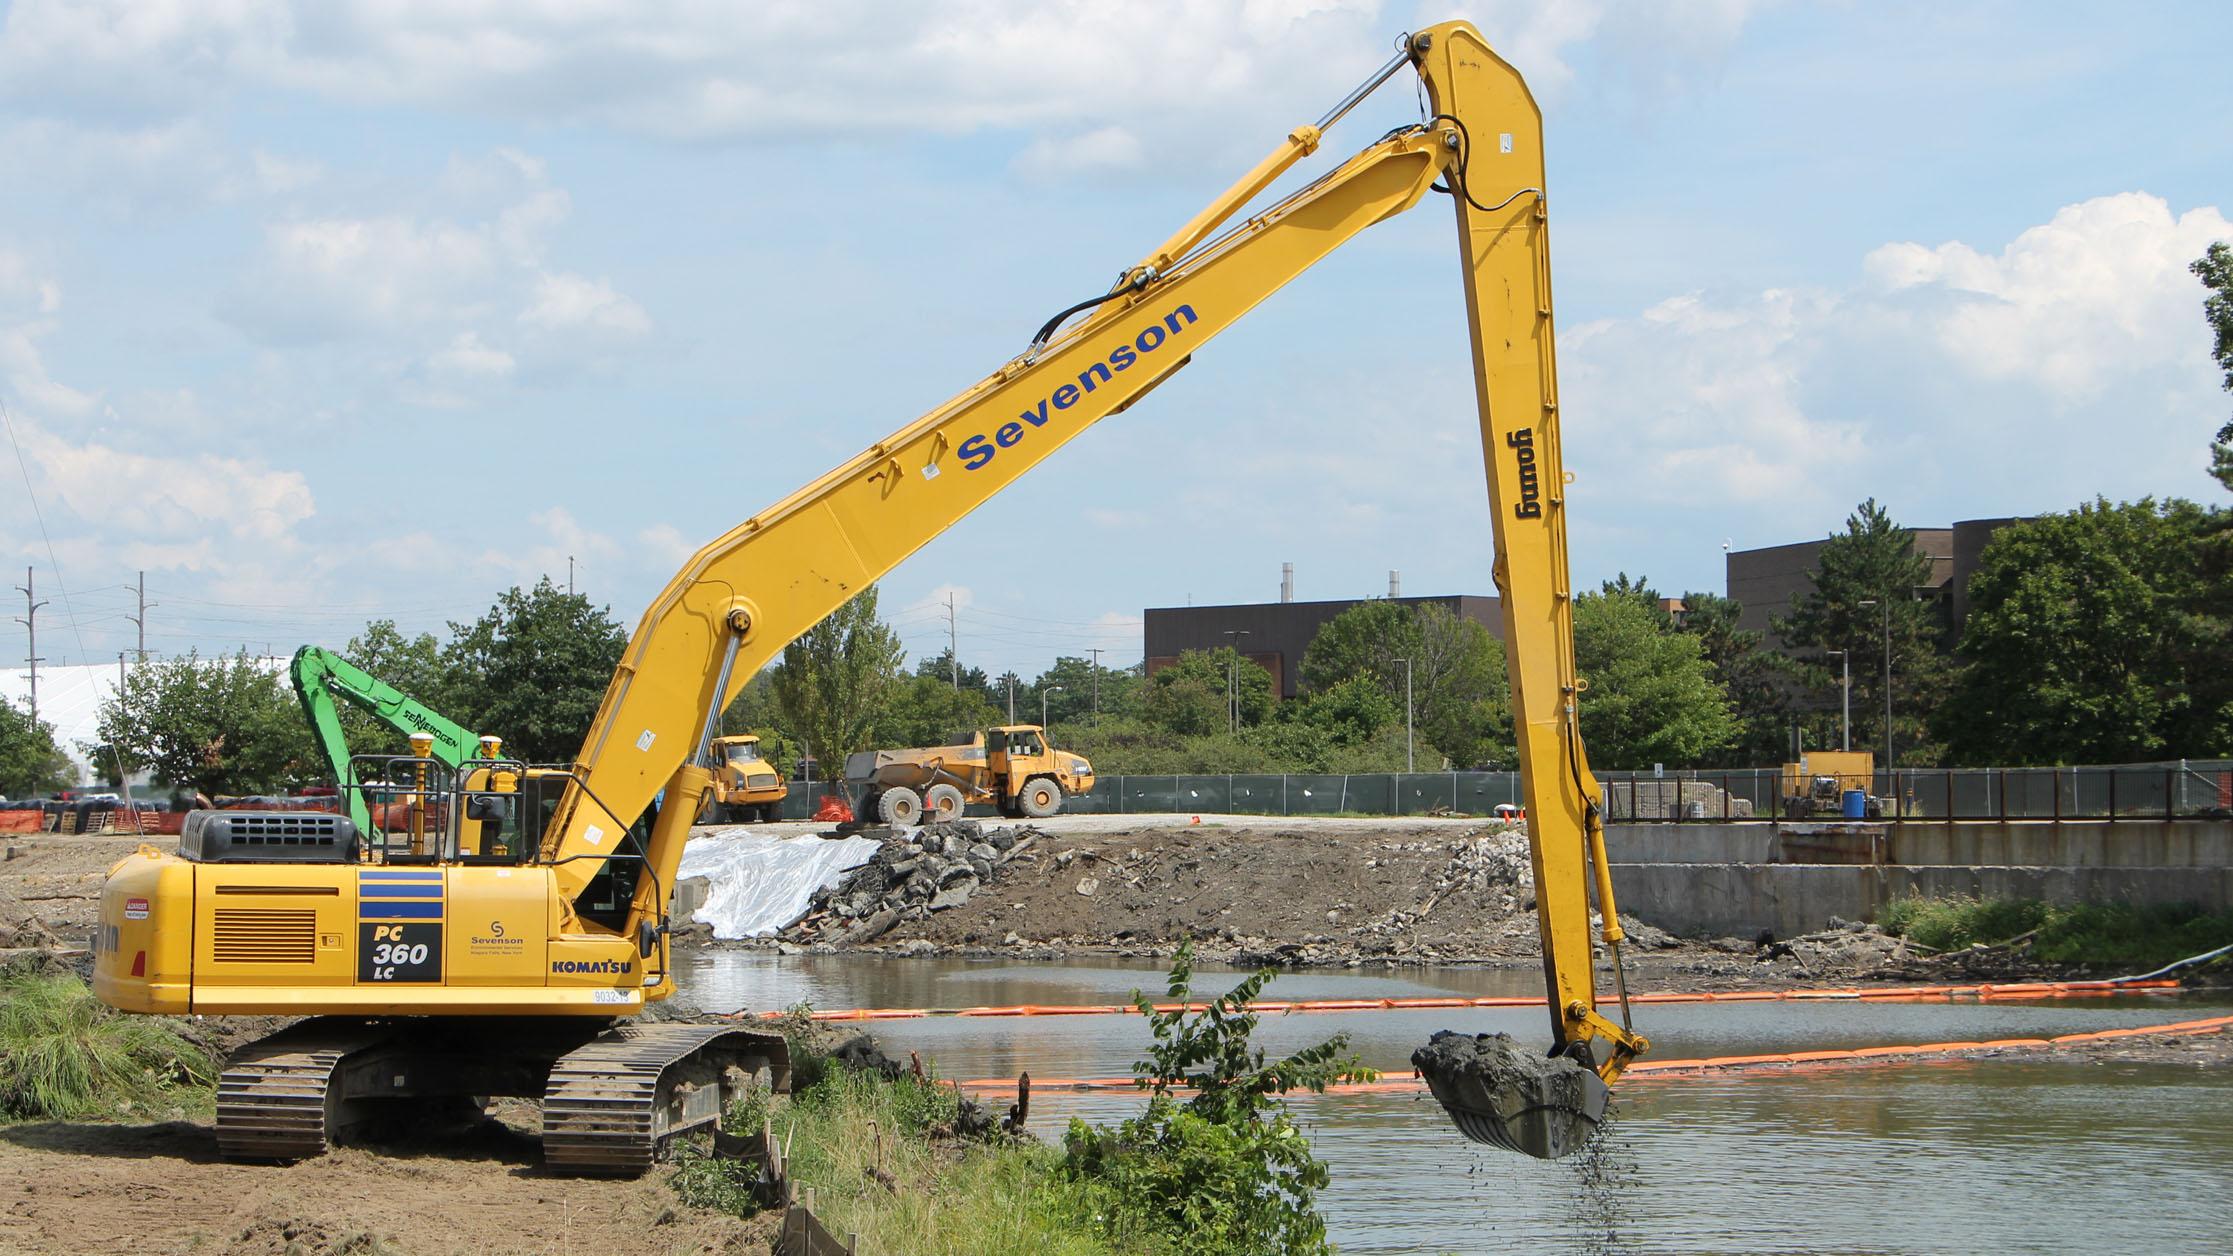 Consumer's clean-up on the Flint River, Flint, Mi